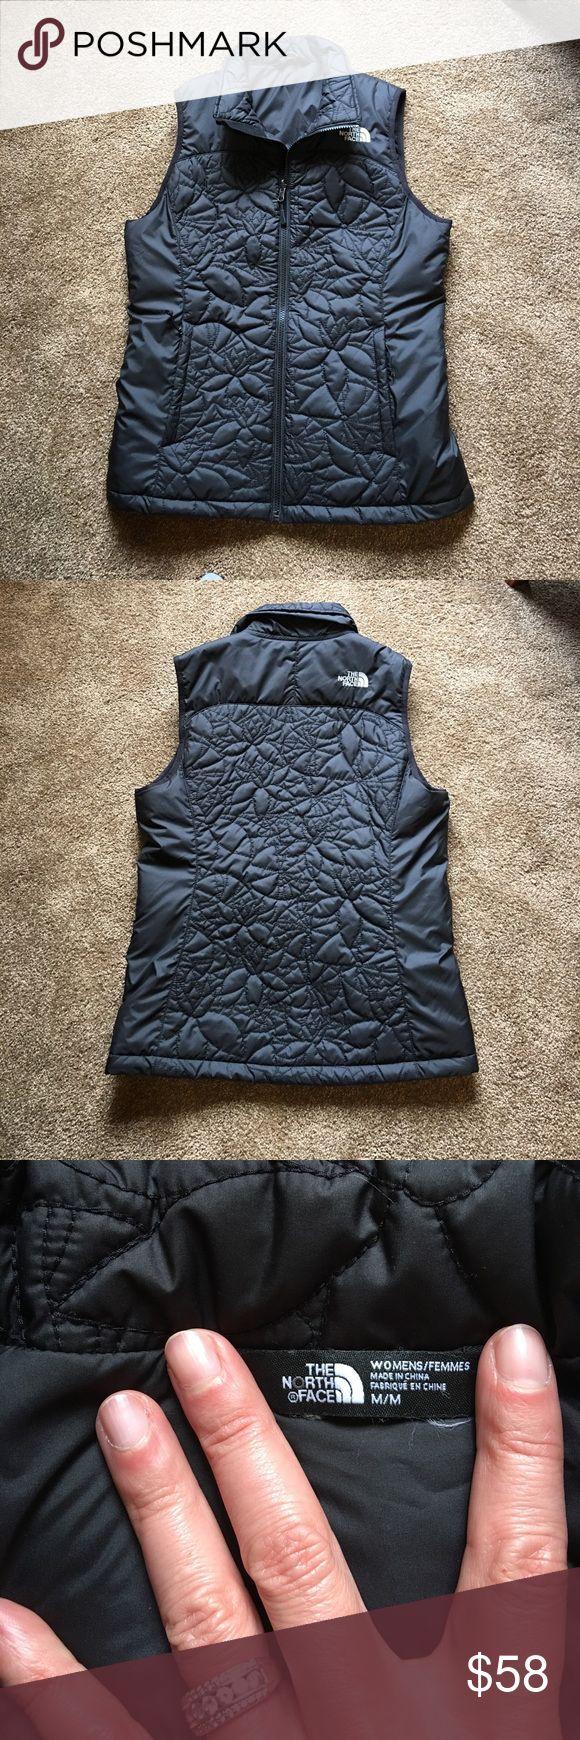 North Face vest North Face vest. Excellent condition. The North Face Jackets & Coats Vests